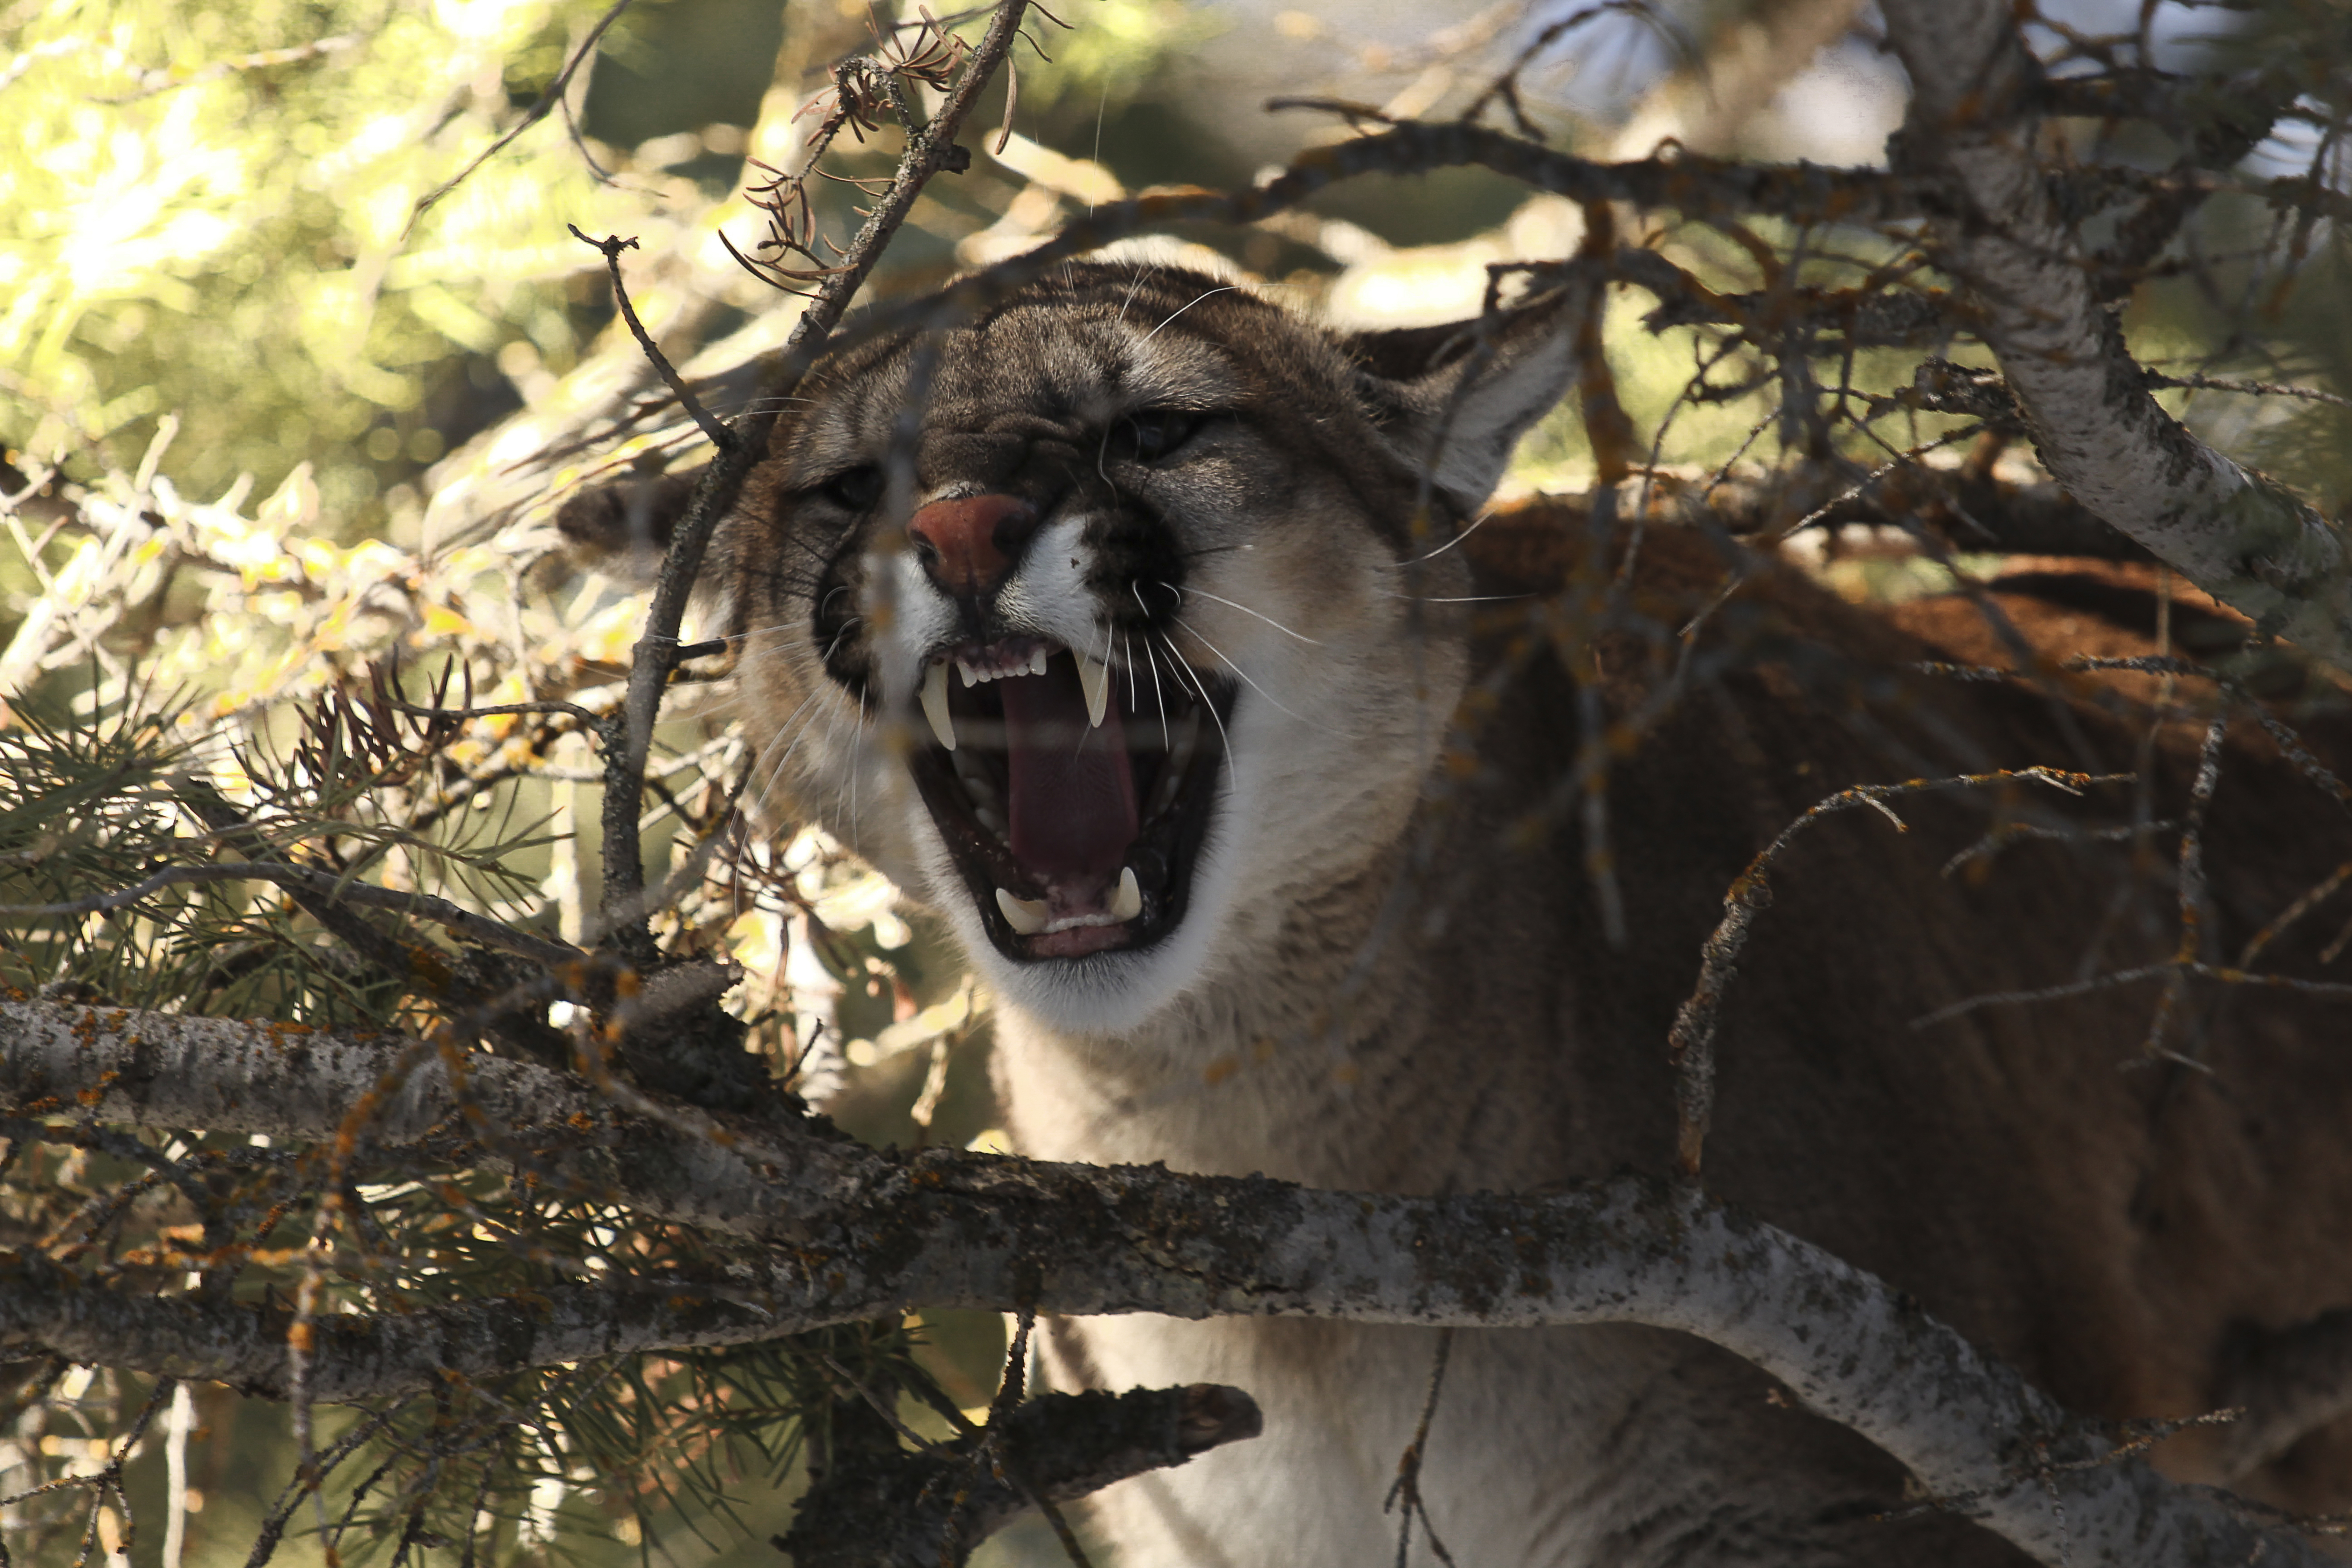 A cougar roars